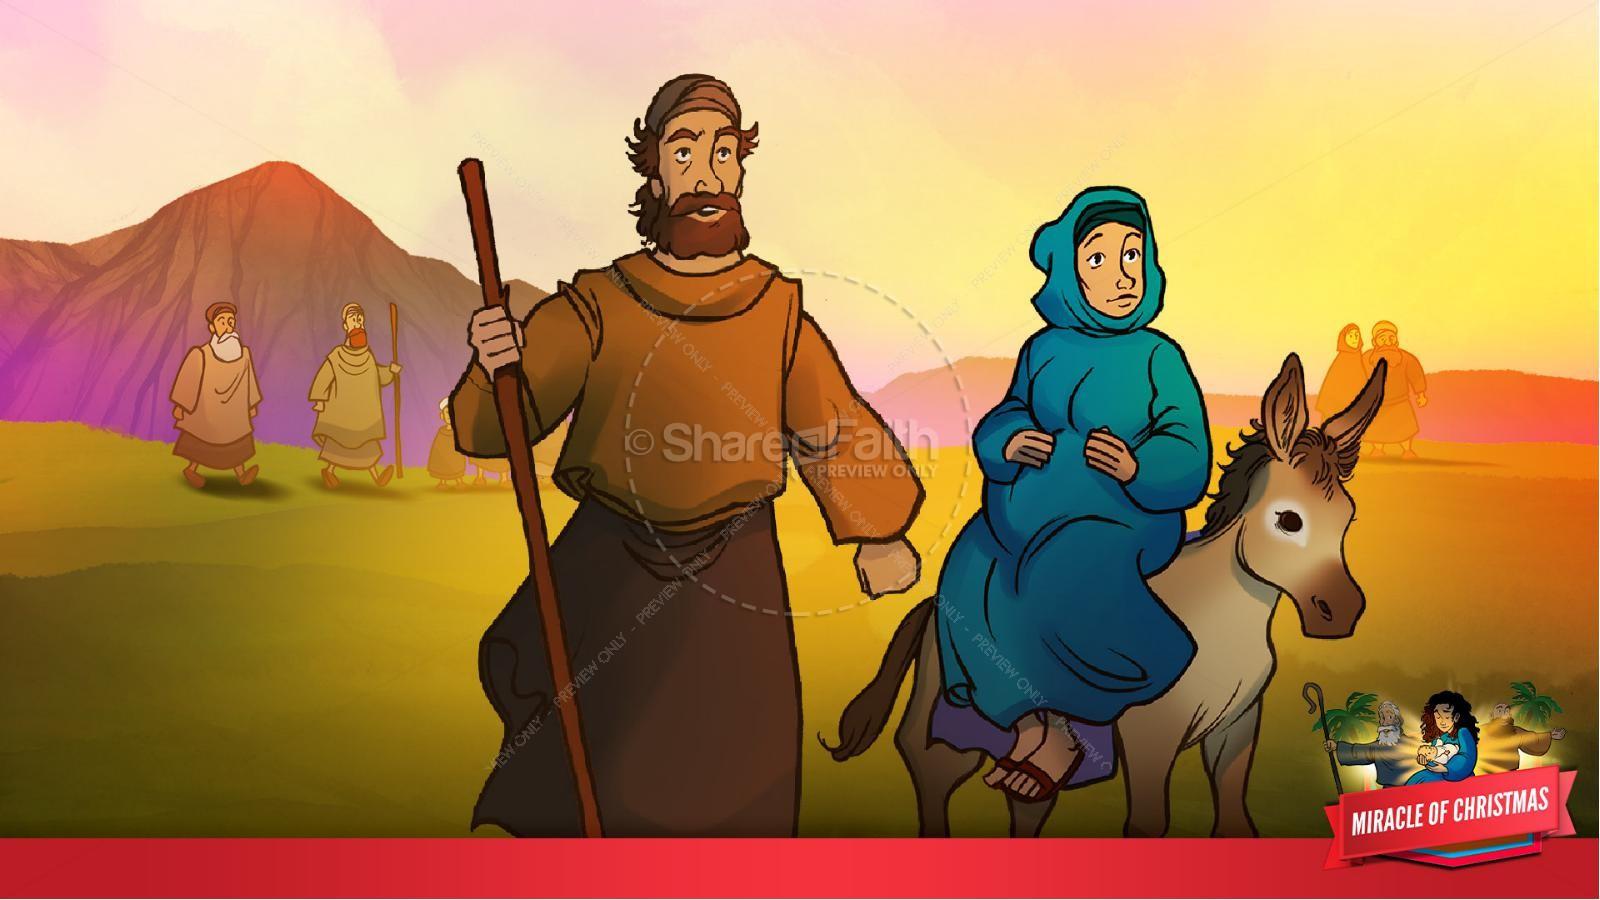 Luke 2 The Miracle of Christmas Kids Bible Story   slide 14